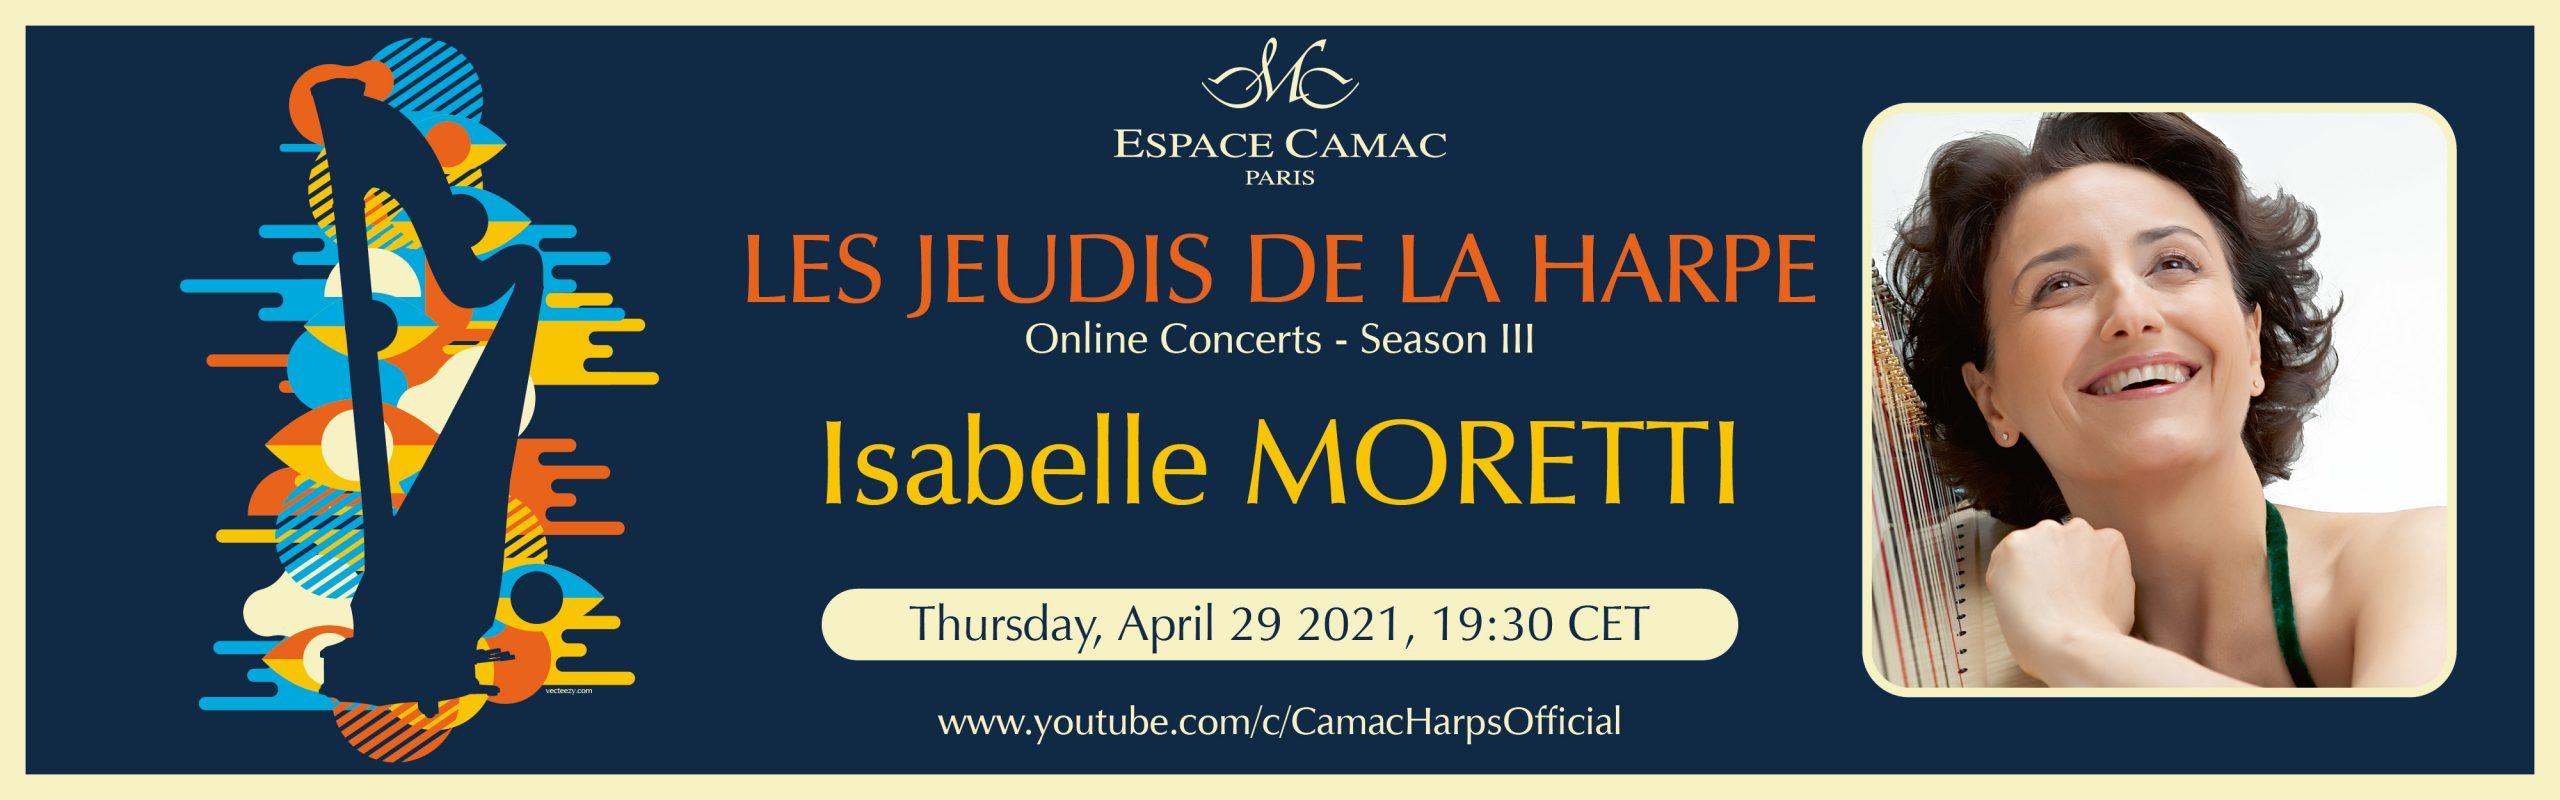 Les Jeudis de la Harpe : Isabelle Moretti